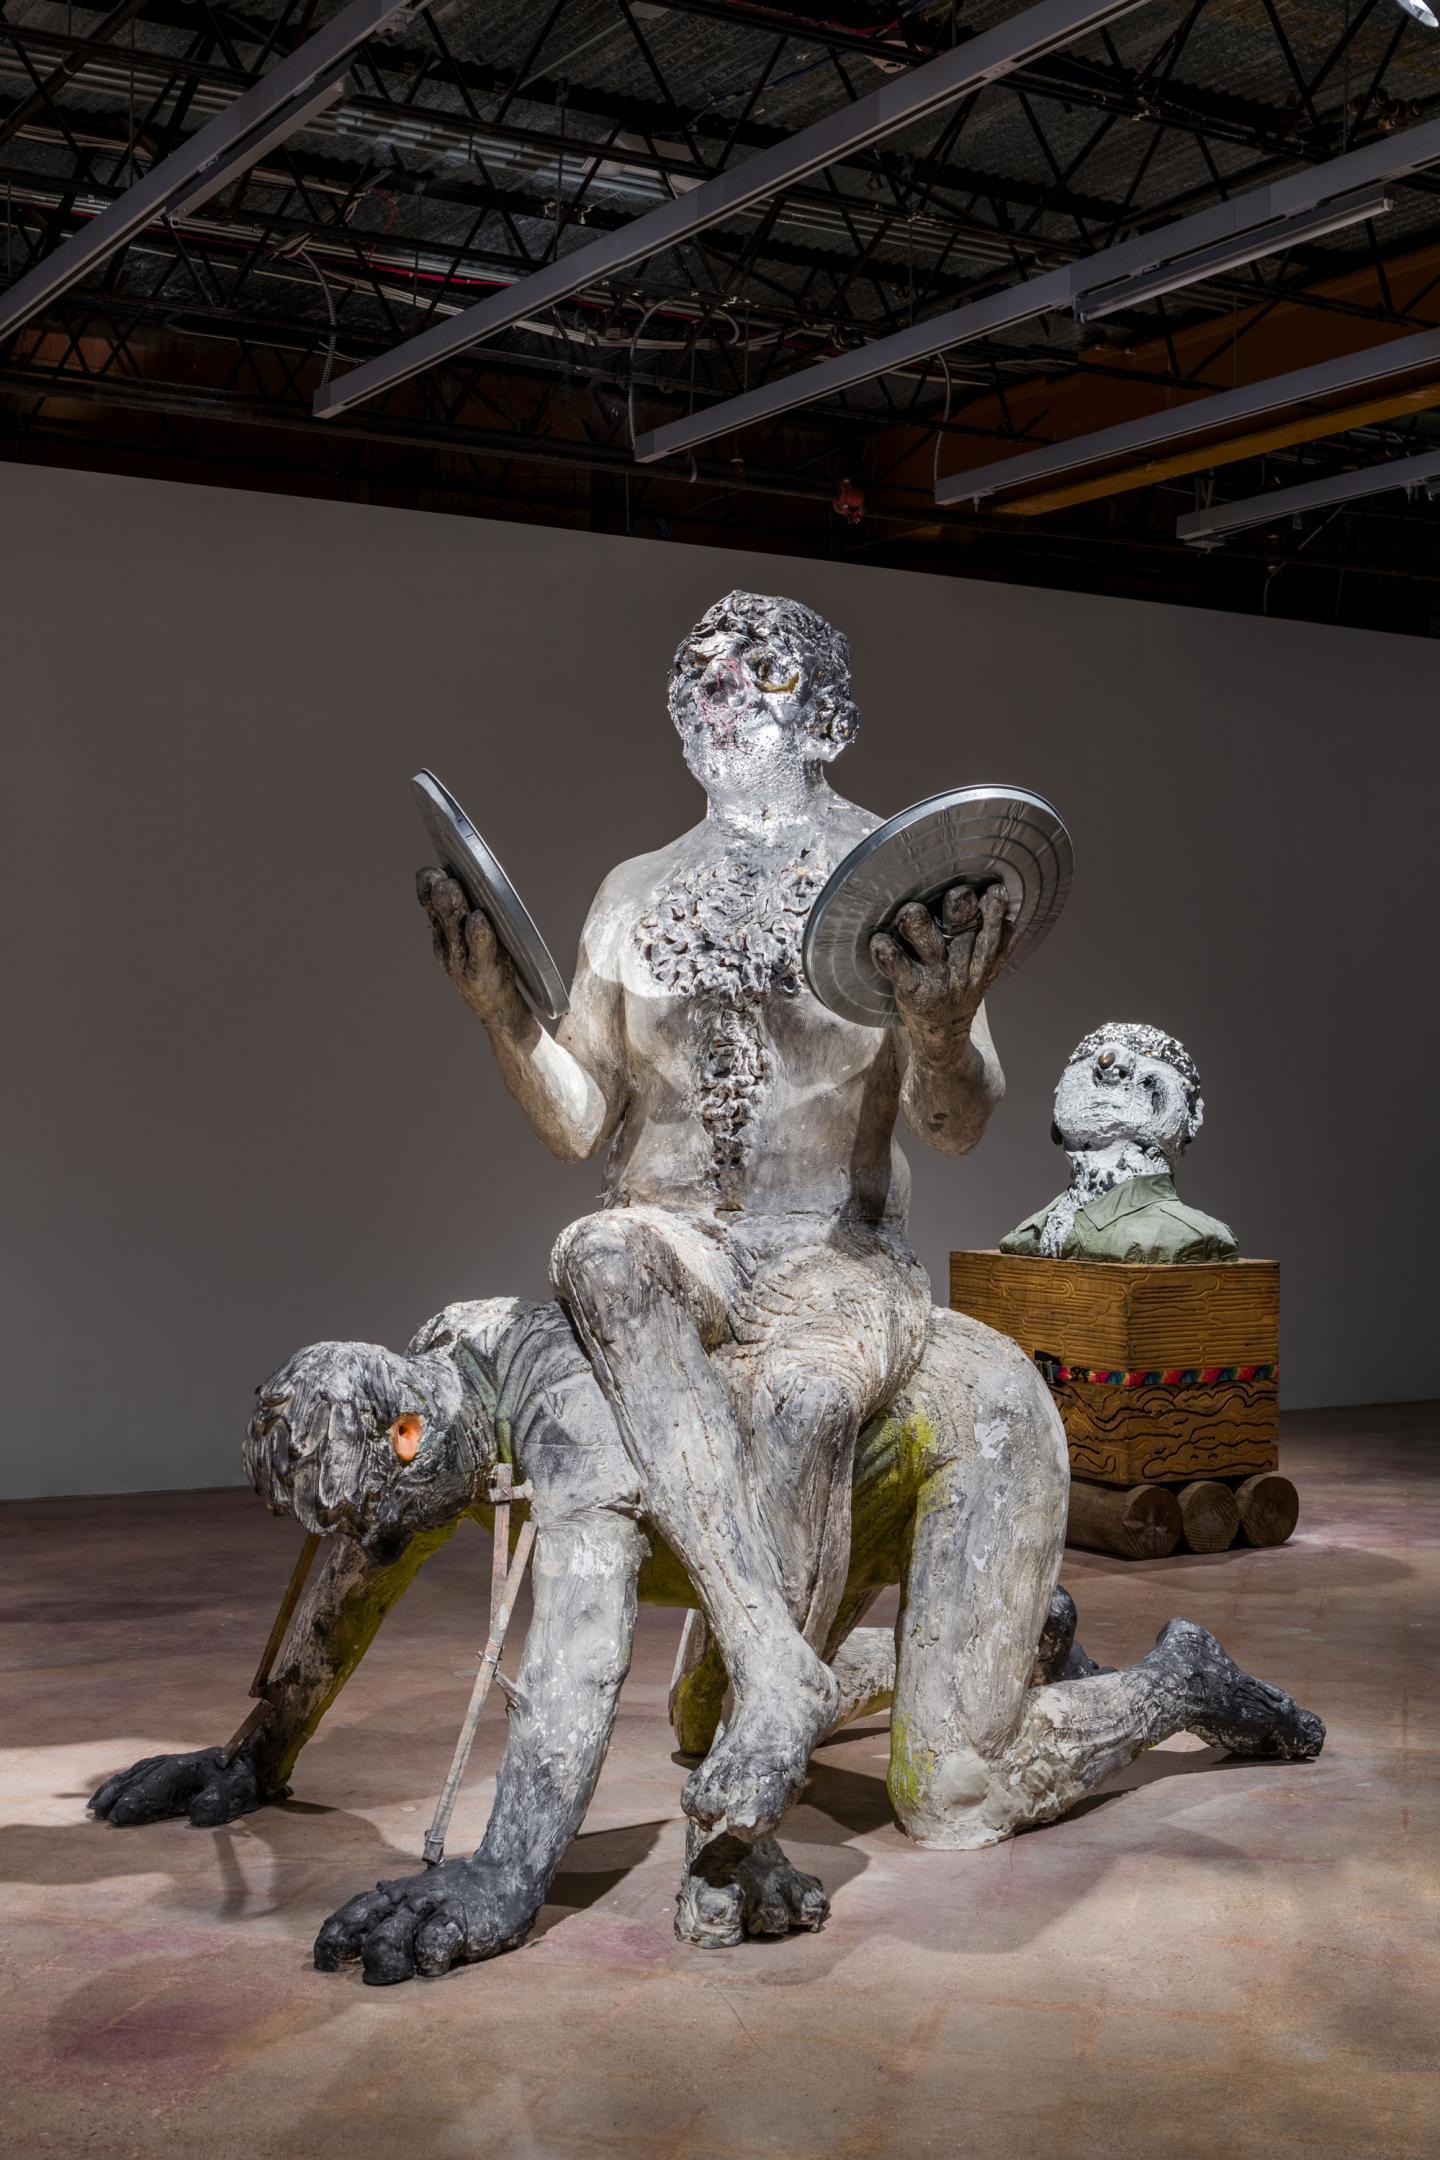 Nicole Eisenman, Procession, 2019-2020, installation view, 'Nicole Eisenman: Sturm und Drang', The Contemporary Austin. Courtesy: the artist, Vielmetter Los Angeles and Anton Kern Gallery, New York; photograph: The Contemporary Austin / Colin Doyle